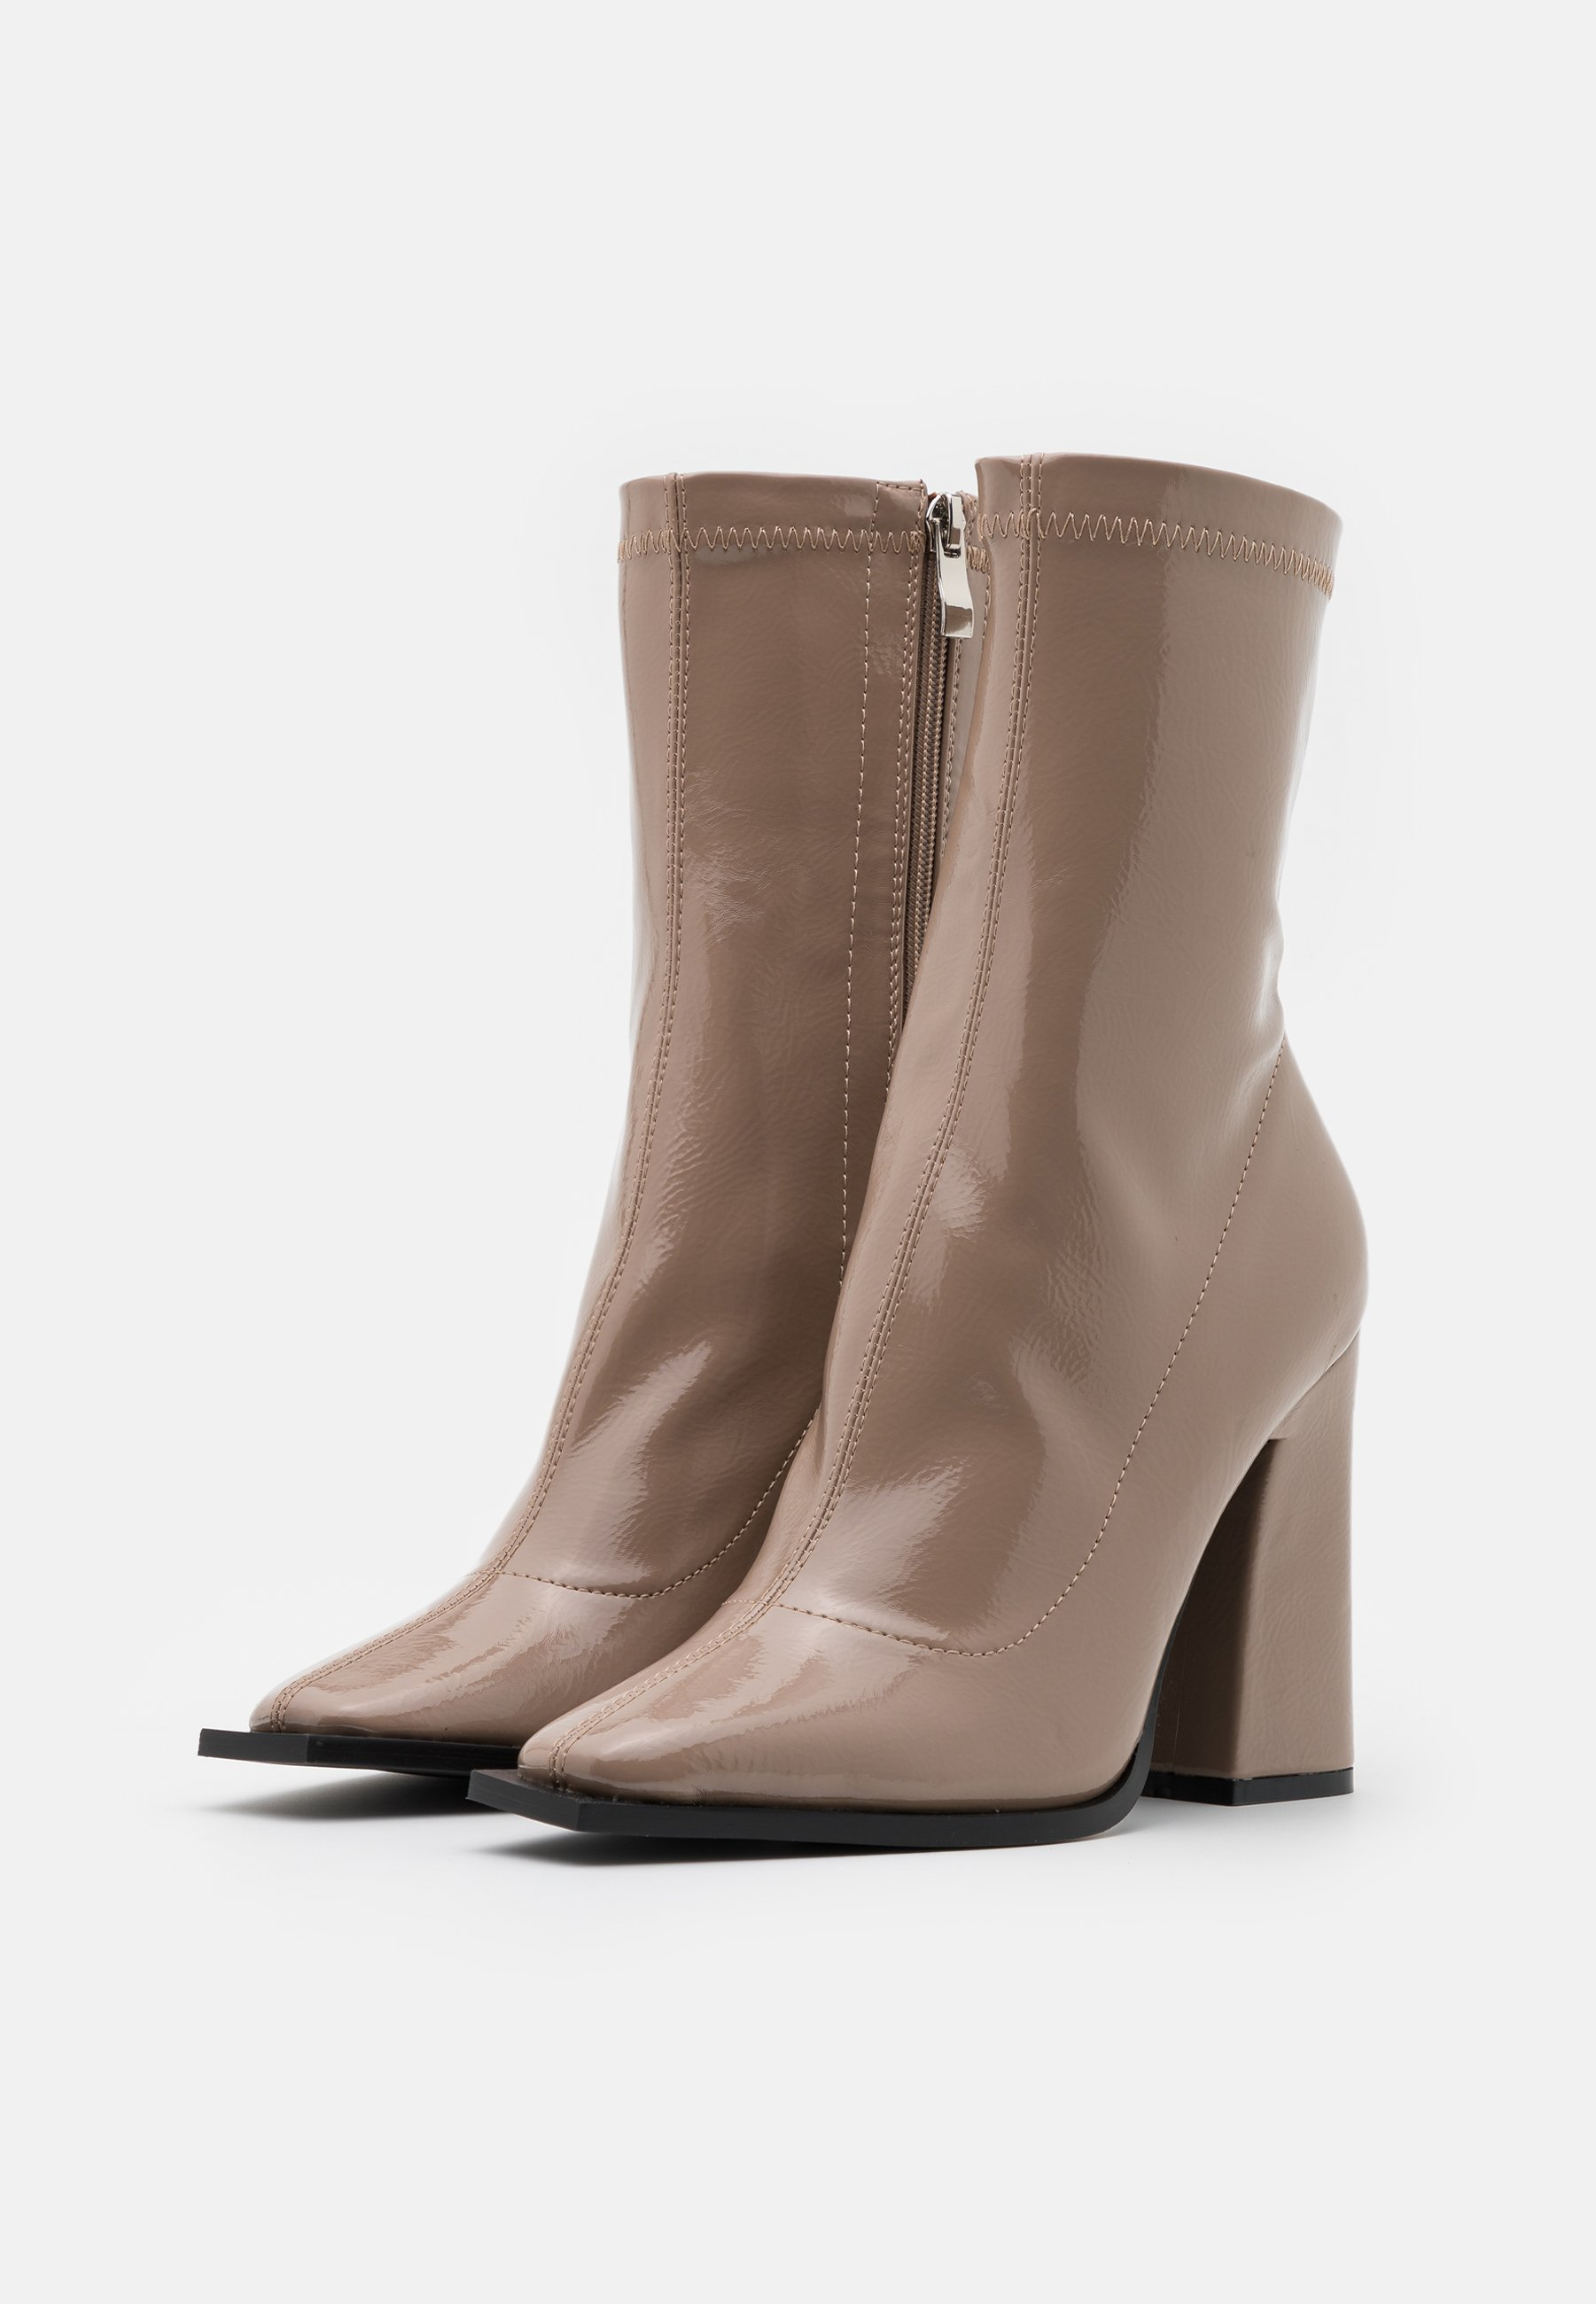 RAID VALENCIA High Heel Stiefelette taupe/taupe